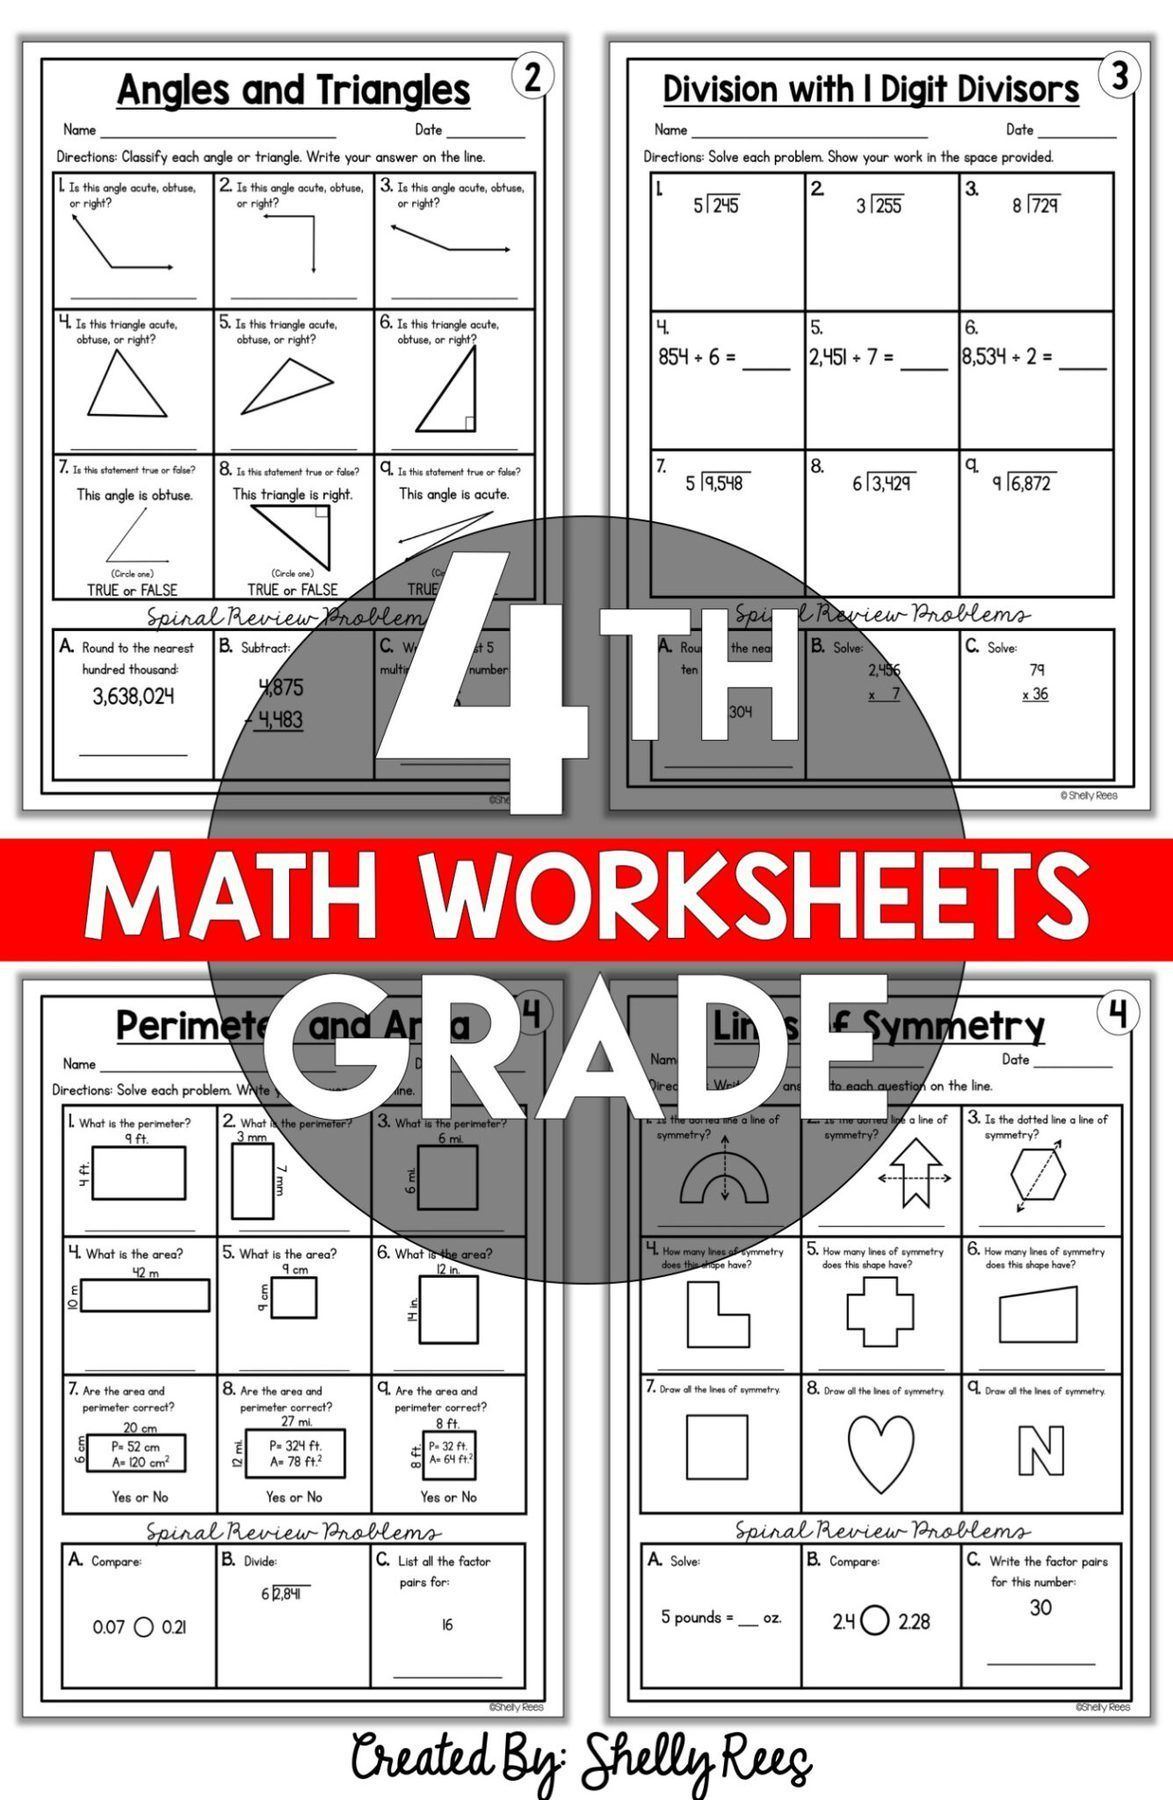 medium resolution of 4th Grade Math Worksheets Free and Printable - Appletastic Learning   4th  grade math worksheets